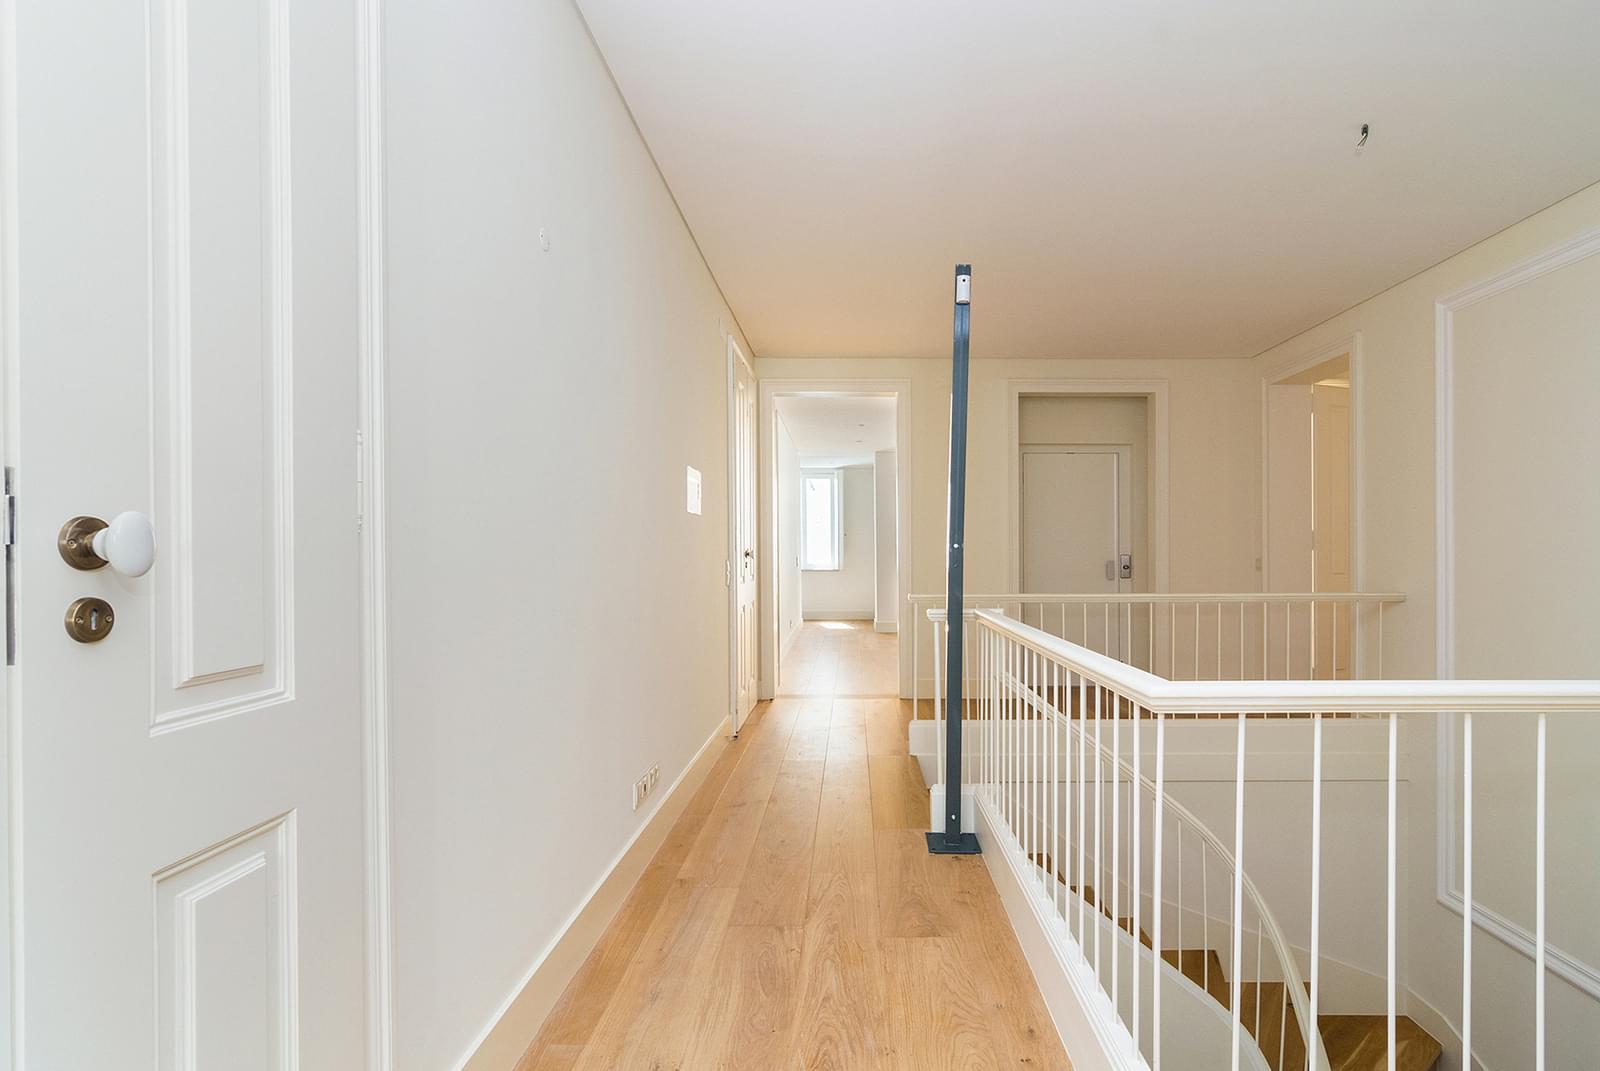 pf16887-apartamento-t5-lisboa-12803ea9-e33d-41c3-9e94-a599ac74b3e7